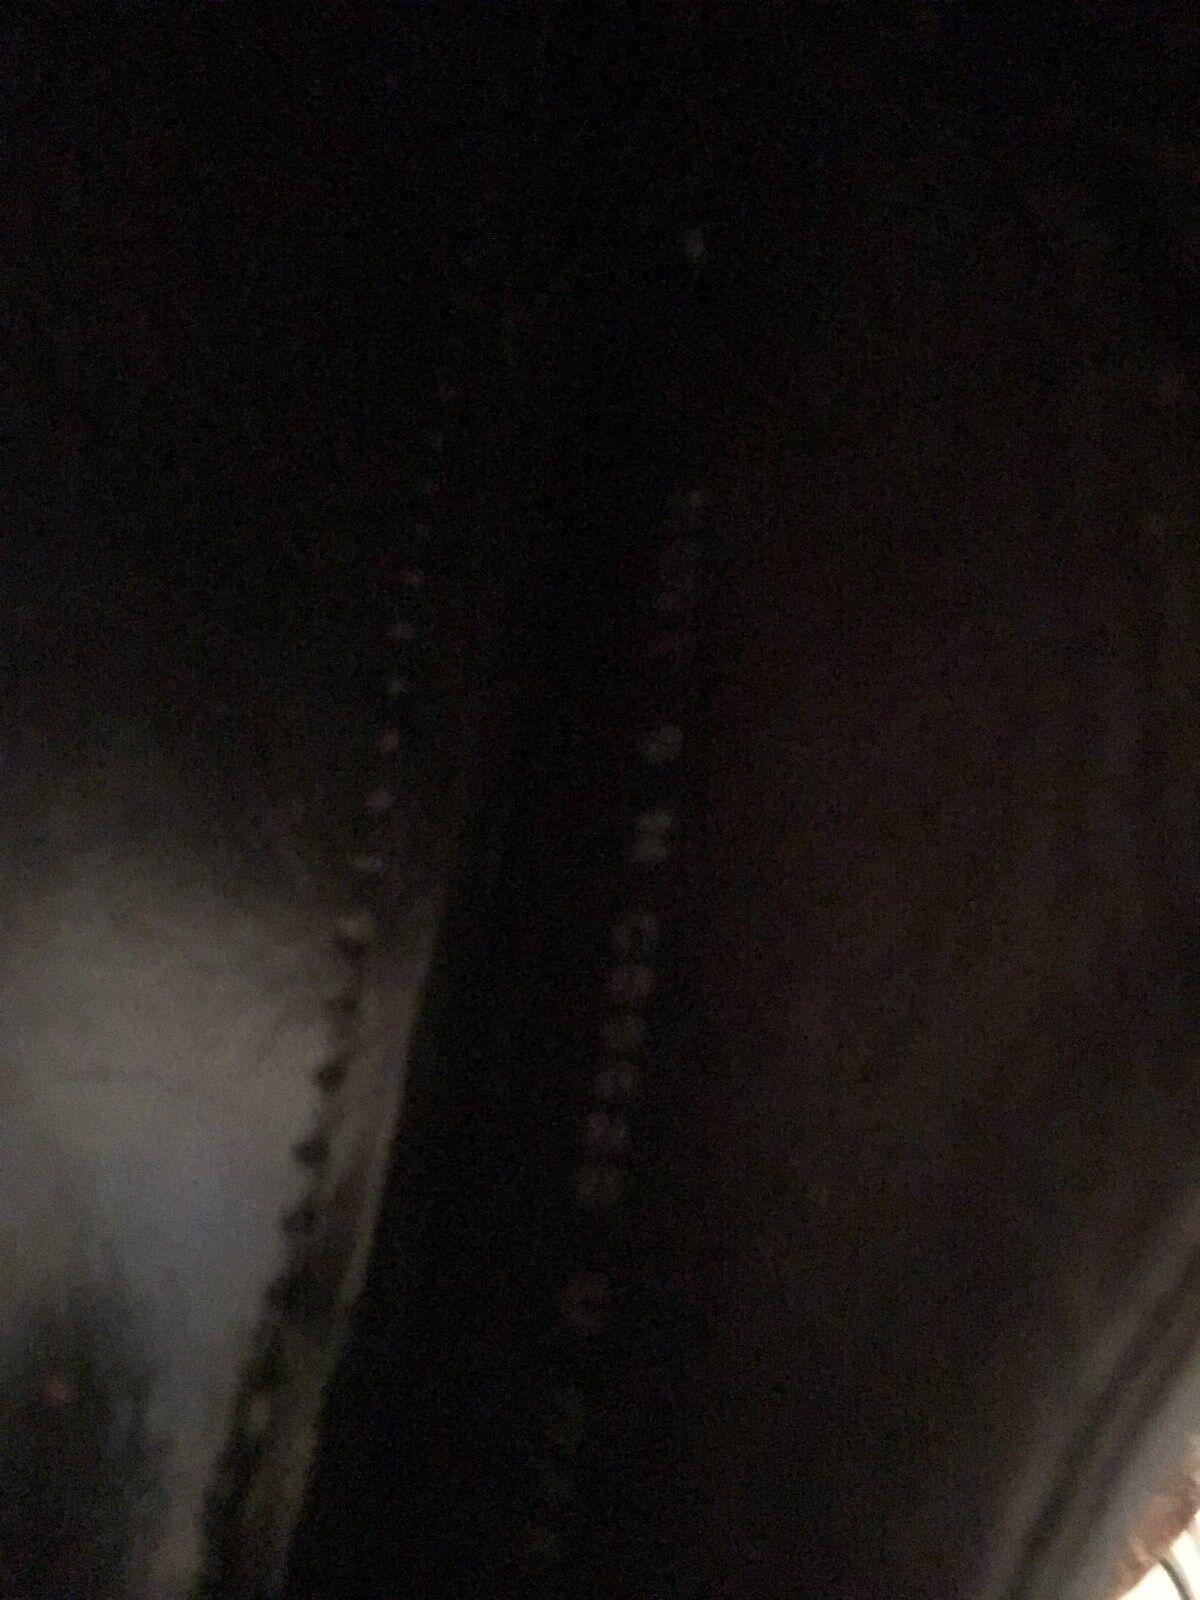 VINTAGE WING TIP BROWN LACE UP BUSINESS POWER SCARPE 9 9 SCARPE M 9762c0